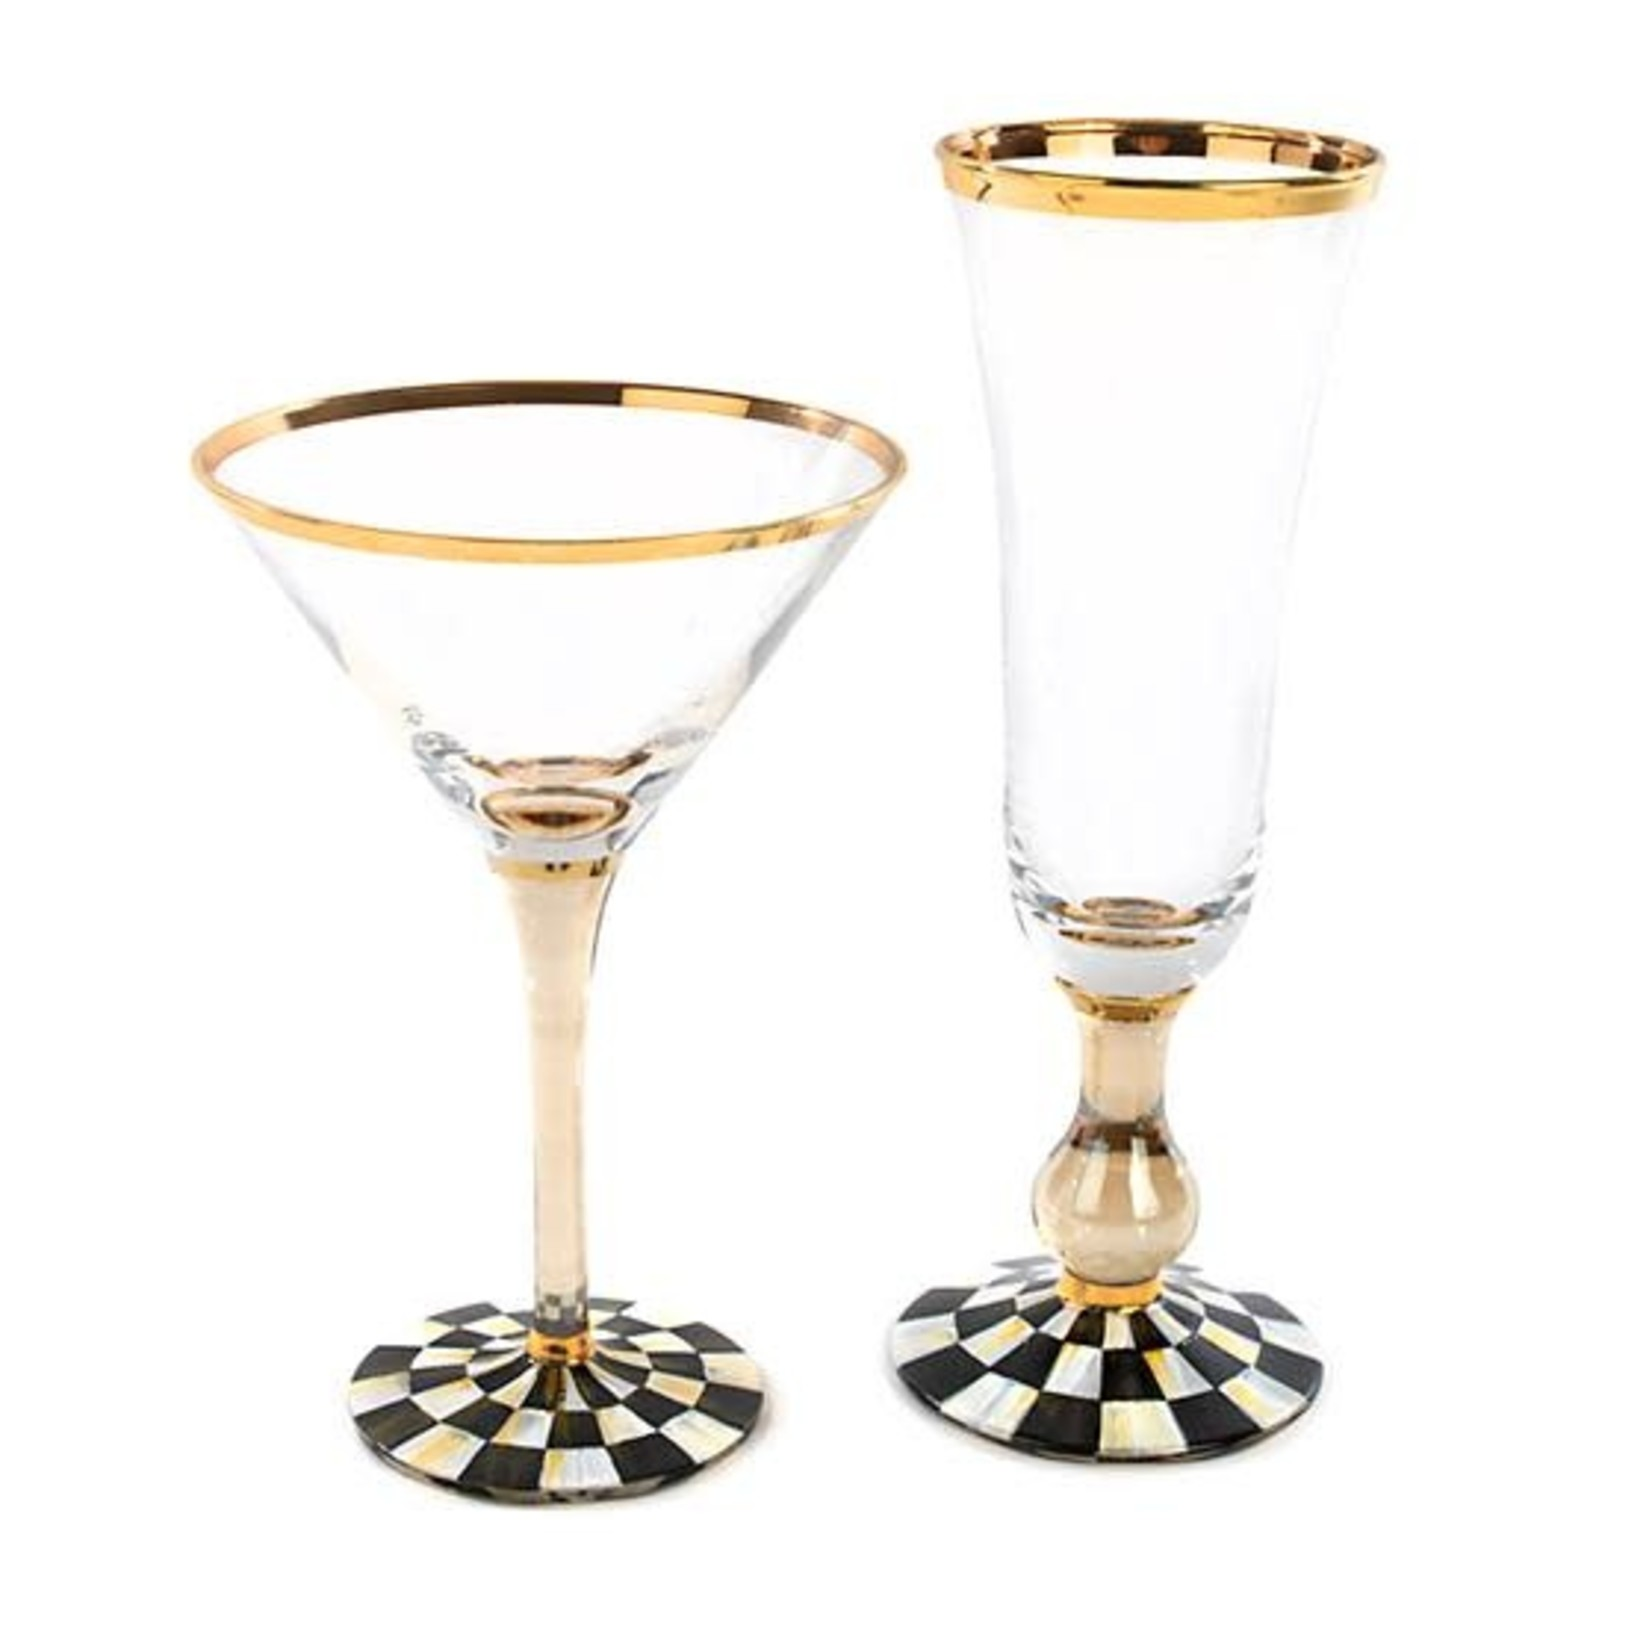 MacKenzie Childs Courtly Check Martini Glass